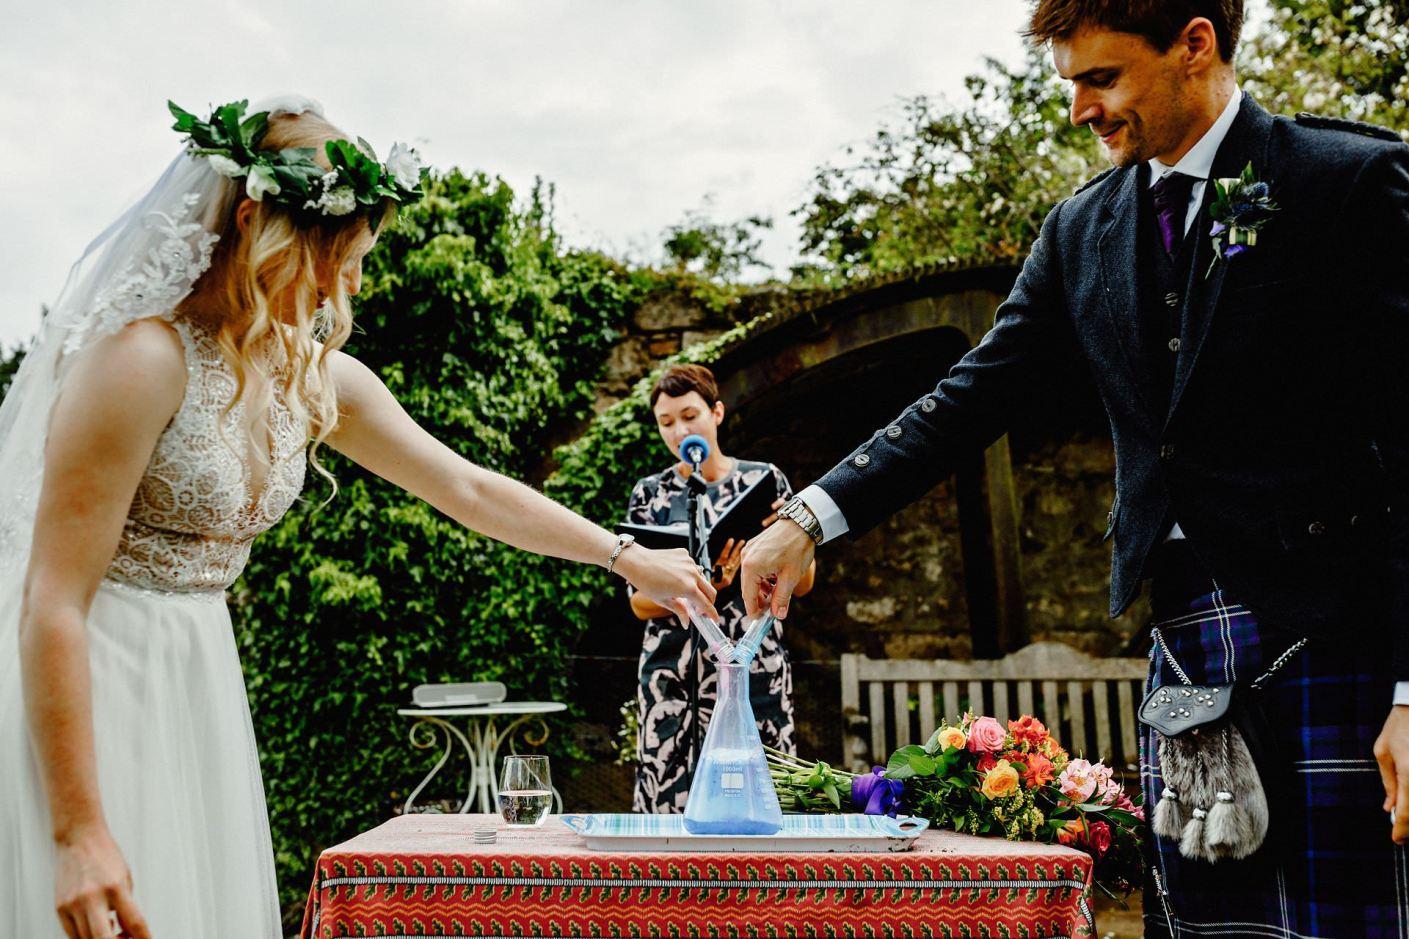 humanist wedding traditions